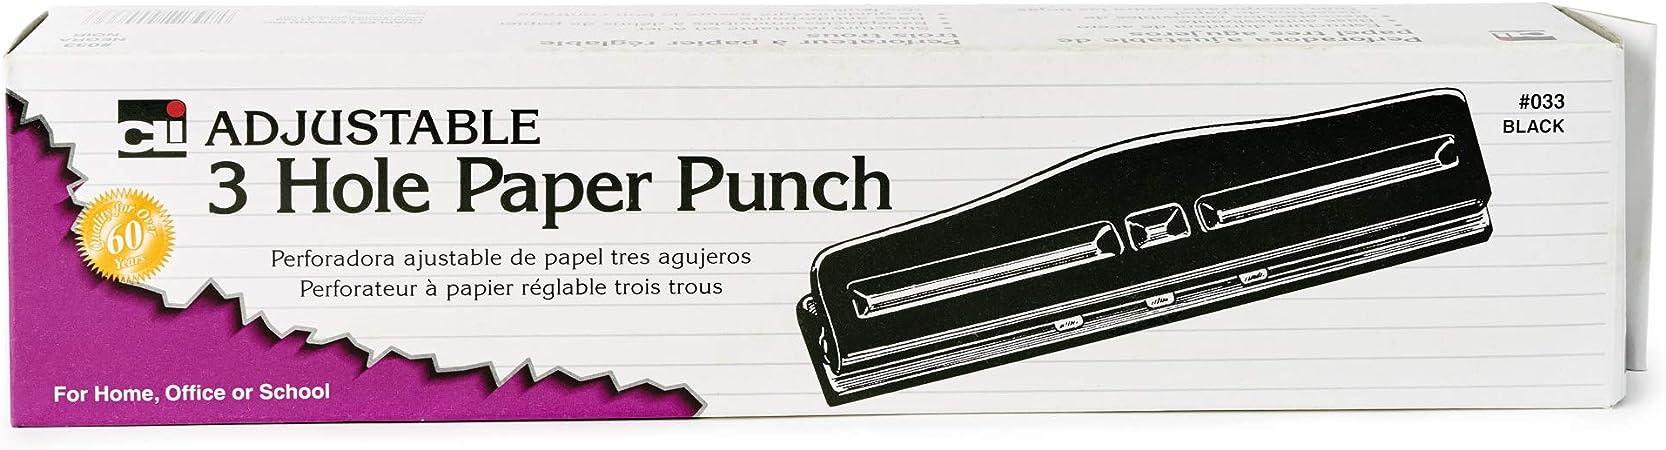 Charles Leonard 3-Hole Paper Punch 1-24 Adjustable Holes 12 Sheet Small